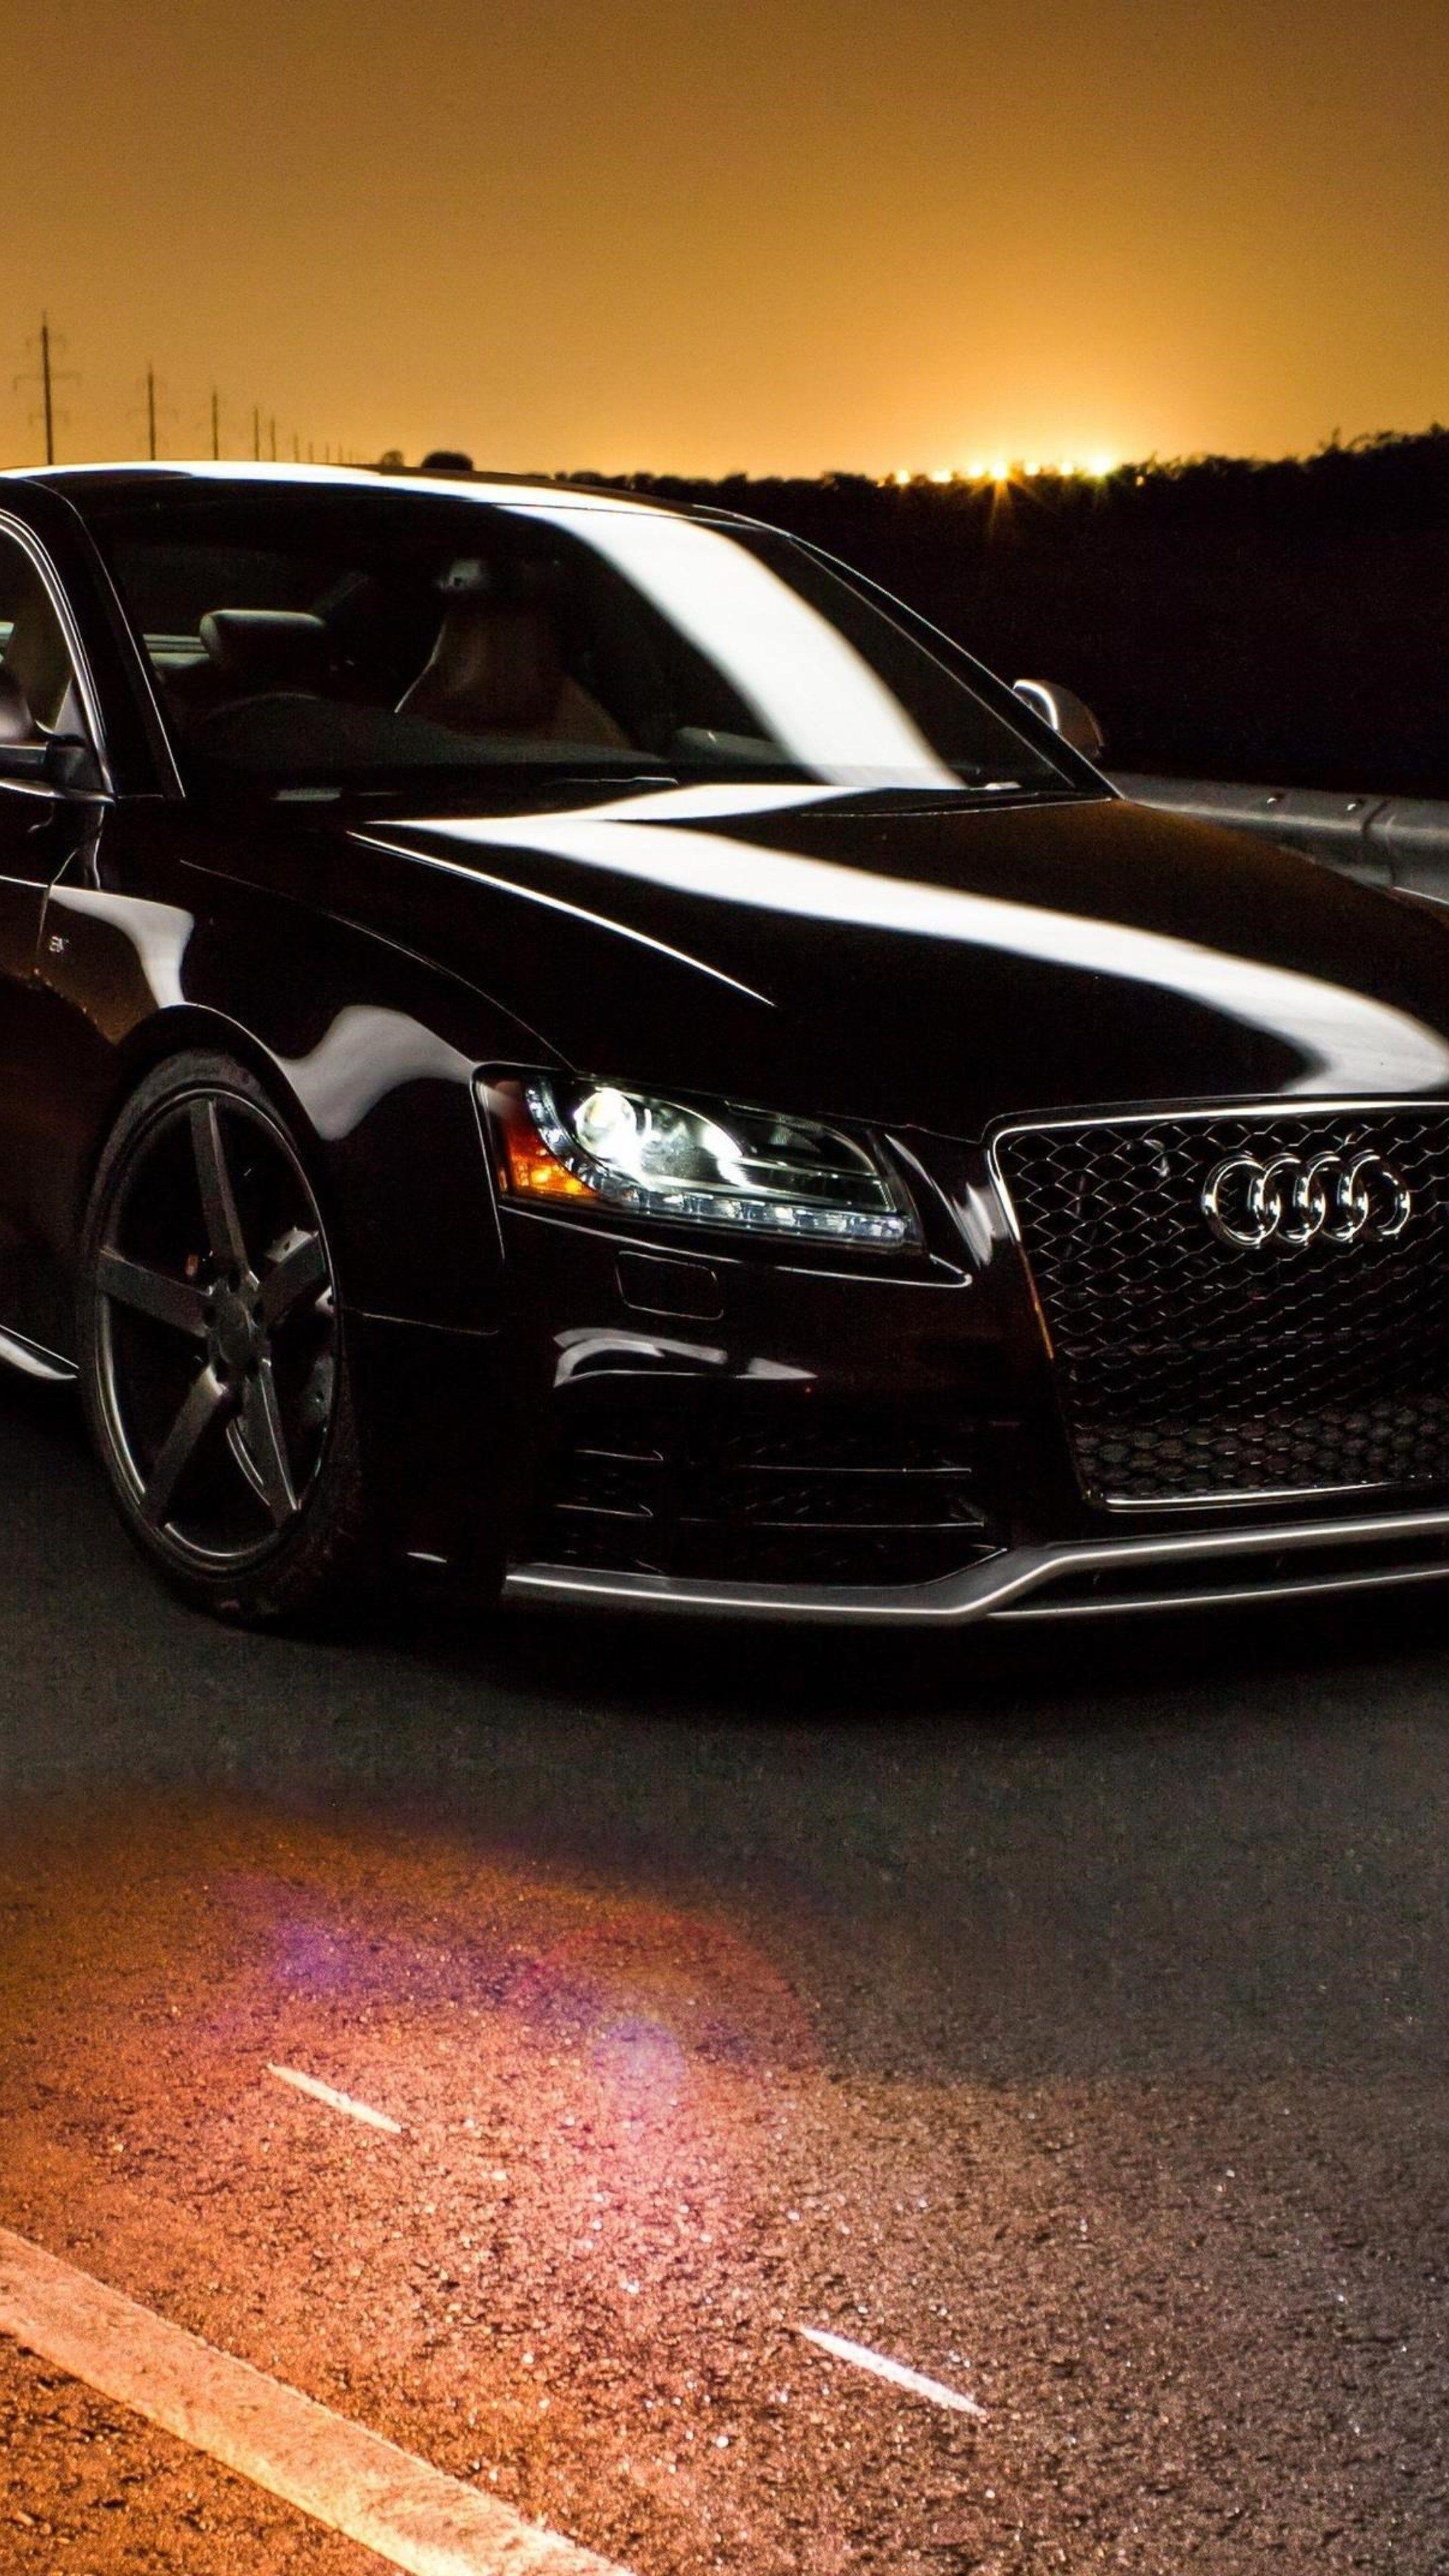 Cars Audi Road Sunset Wallpapers Hd Wallpaper App Qhd